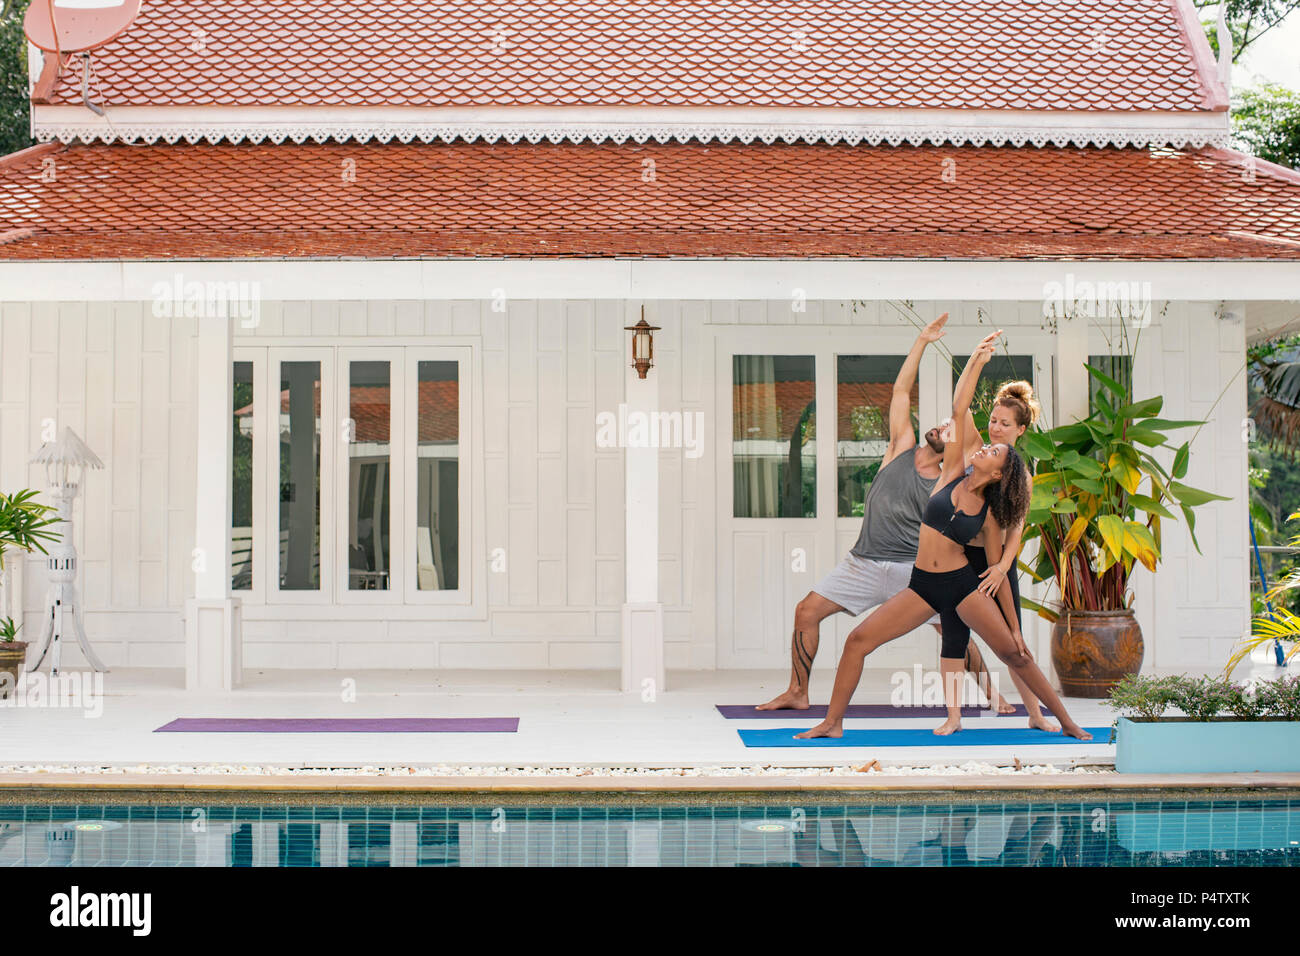 Yogalehrer lehre Frau richtige yoga Pose auf der Terrasse Stockbild